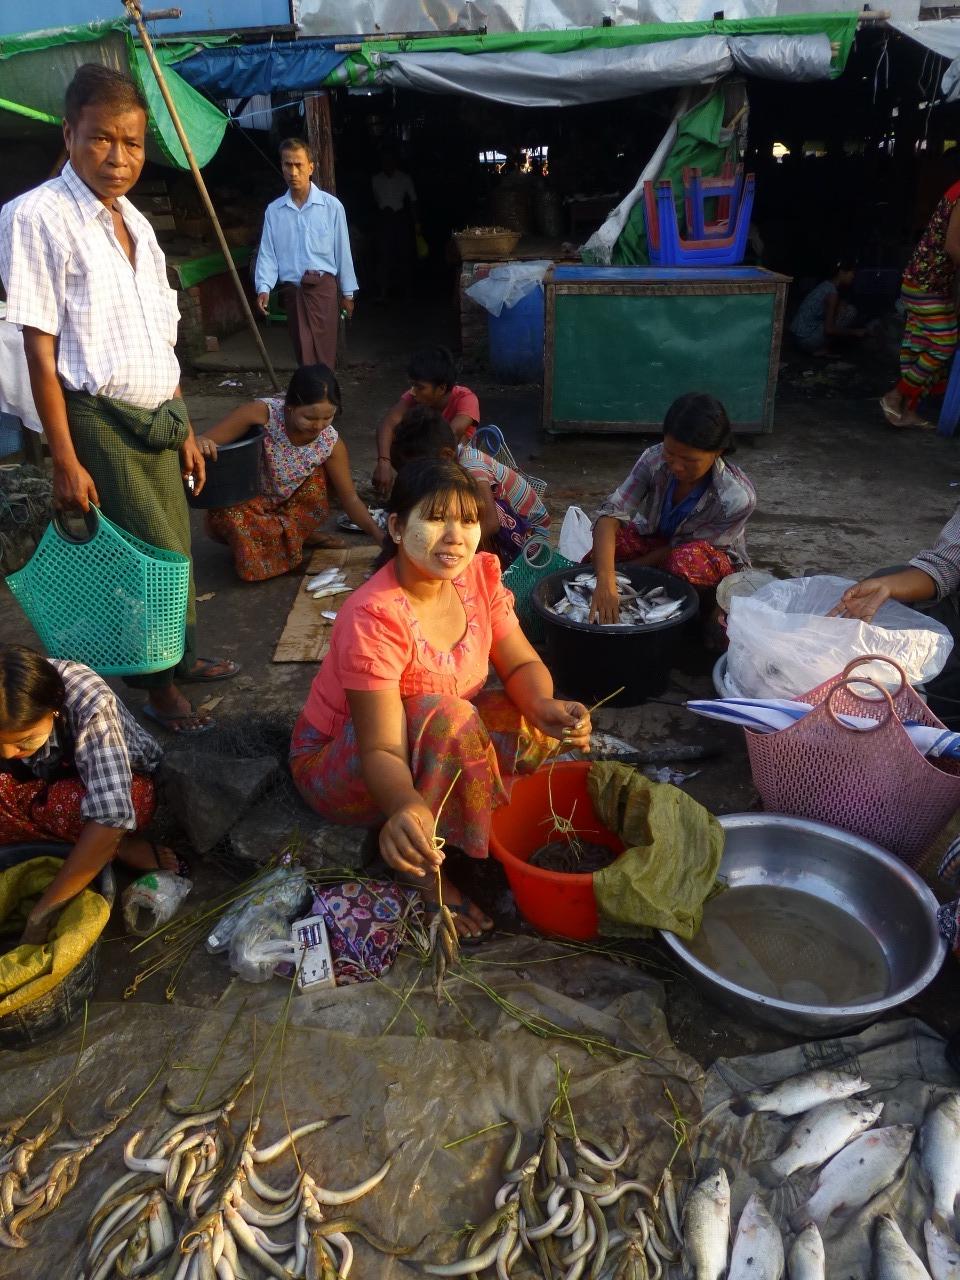 7.1477520383.fish-vendor-at-sittwe-morning-market